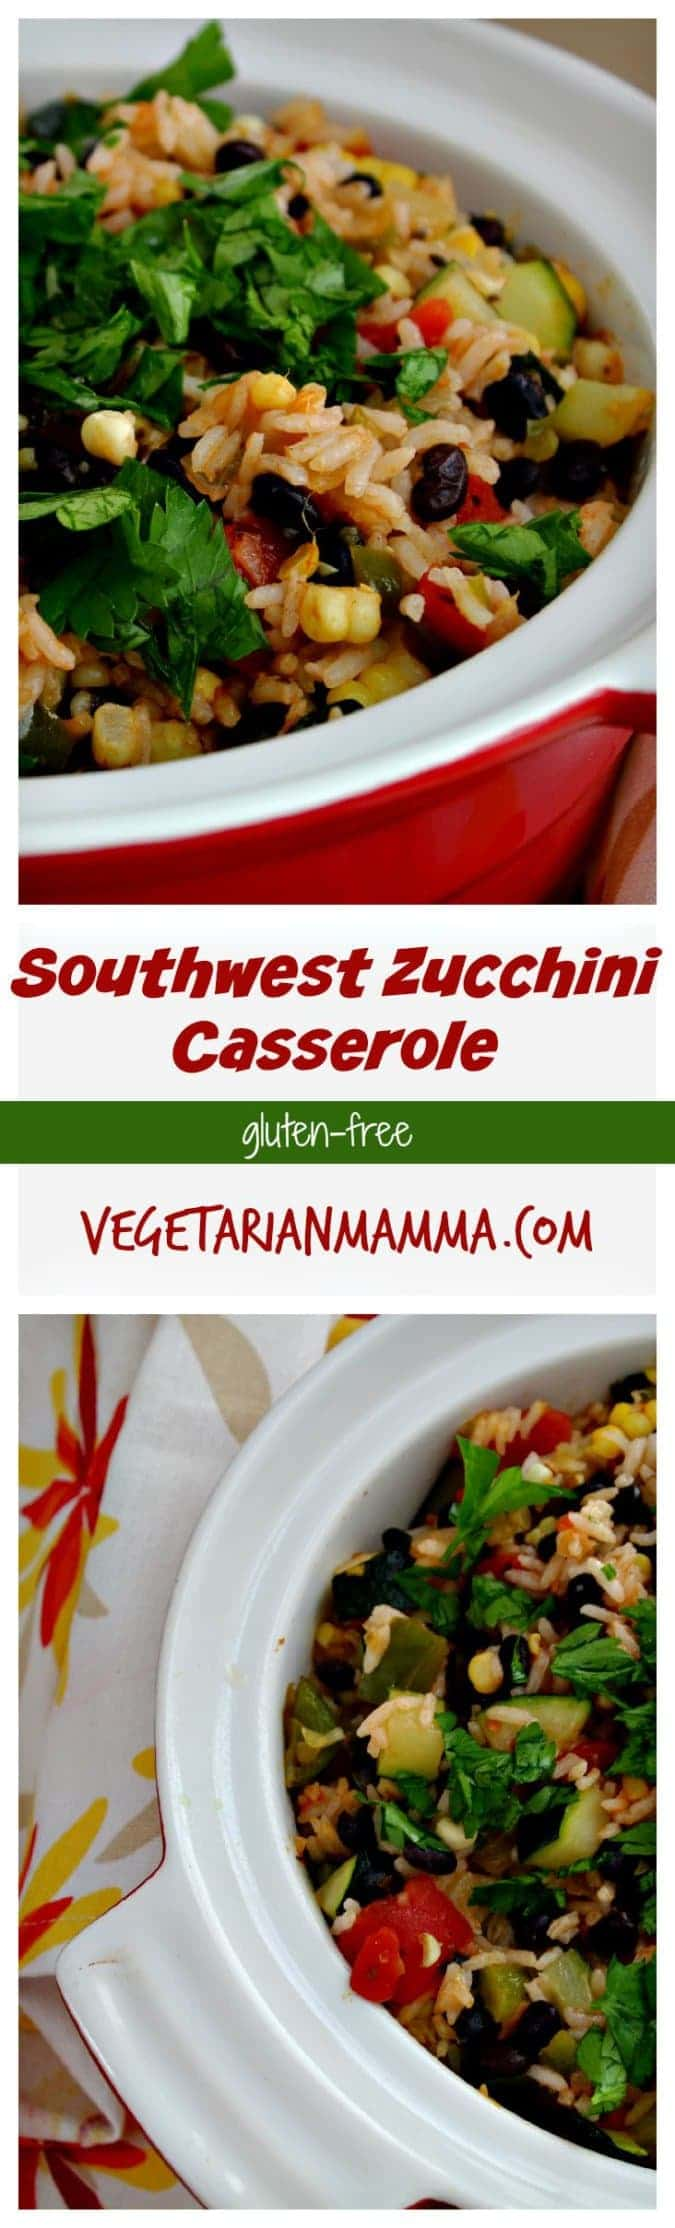 Southwest Zucchini Casserole - #glutenfree #vegetarian #zucchini #casserole #nutfree #dairyfree options @vegetarianmamma.com